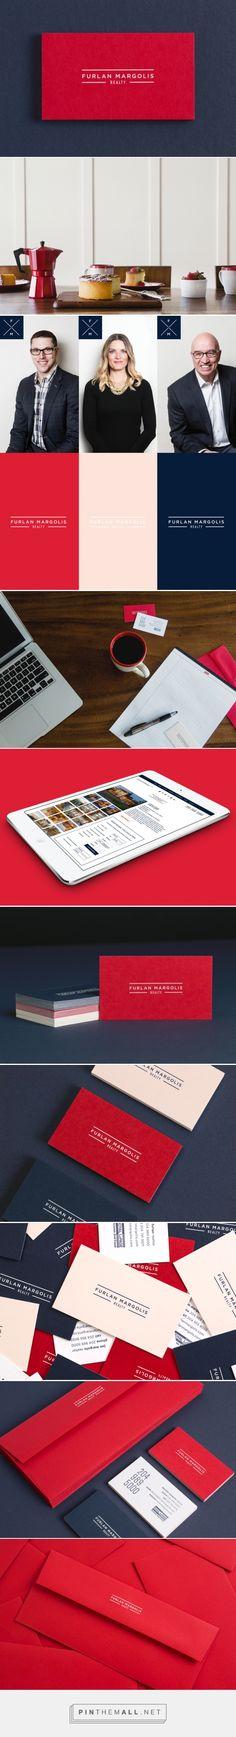 Furlan Margolis Realty Branding by One Plus One Design | Fivestar Branding – Design and Branding Agency & Inspiration Gallery